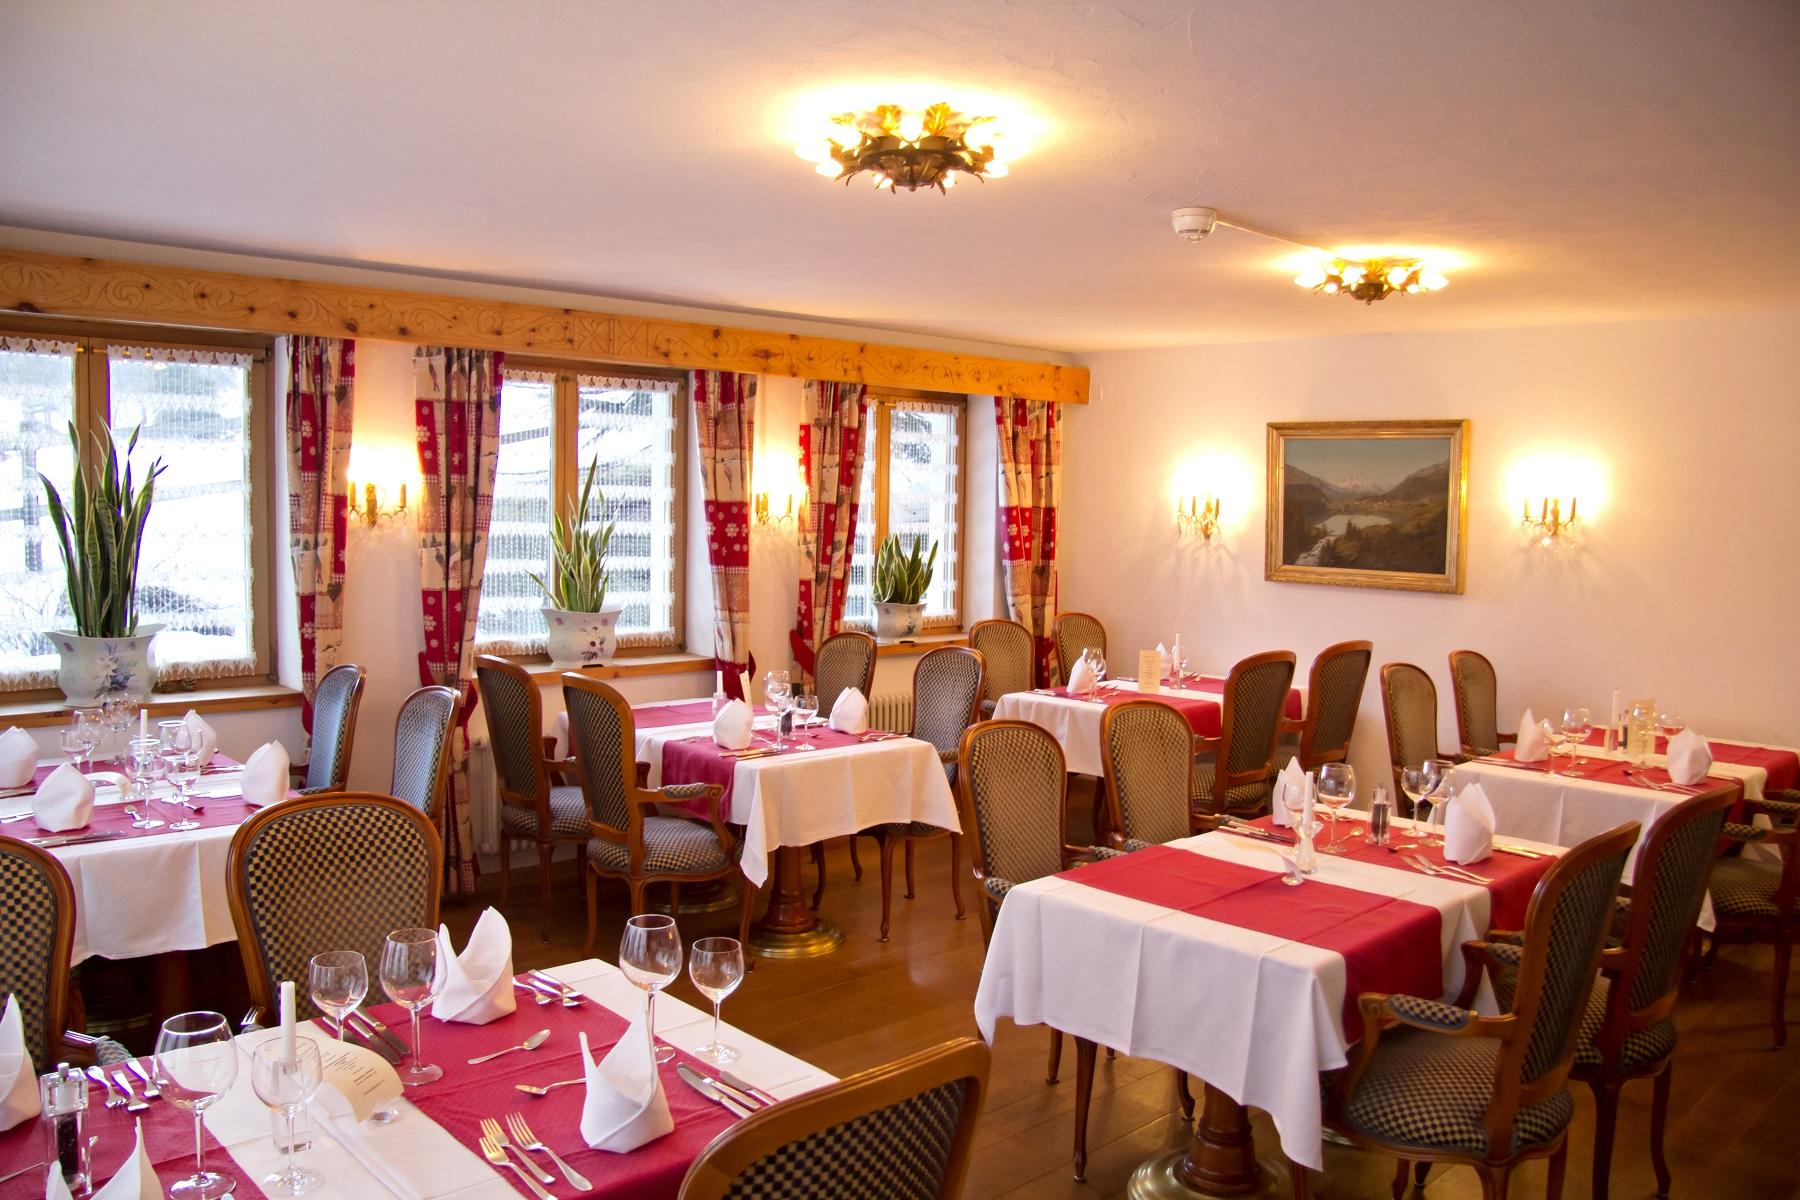 Hotel Nolda St. Moritz Restaurant